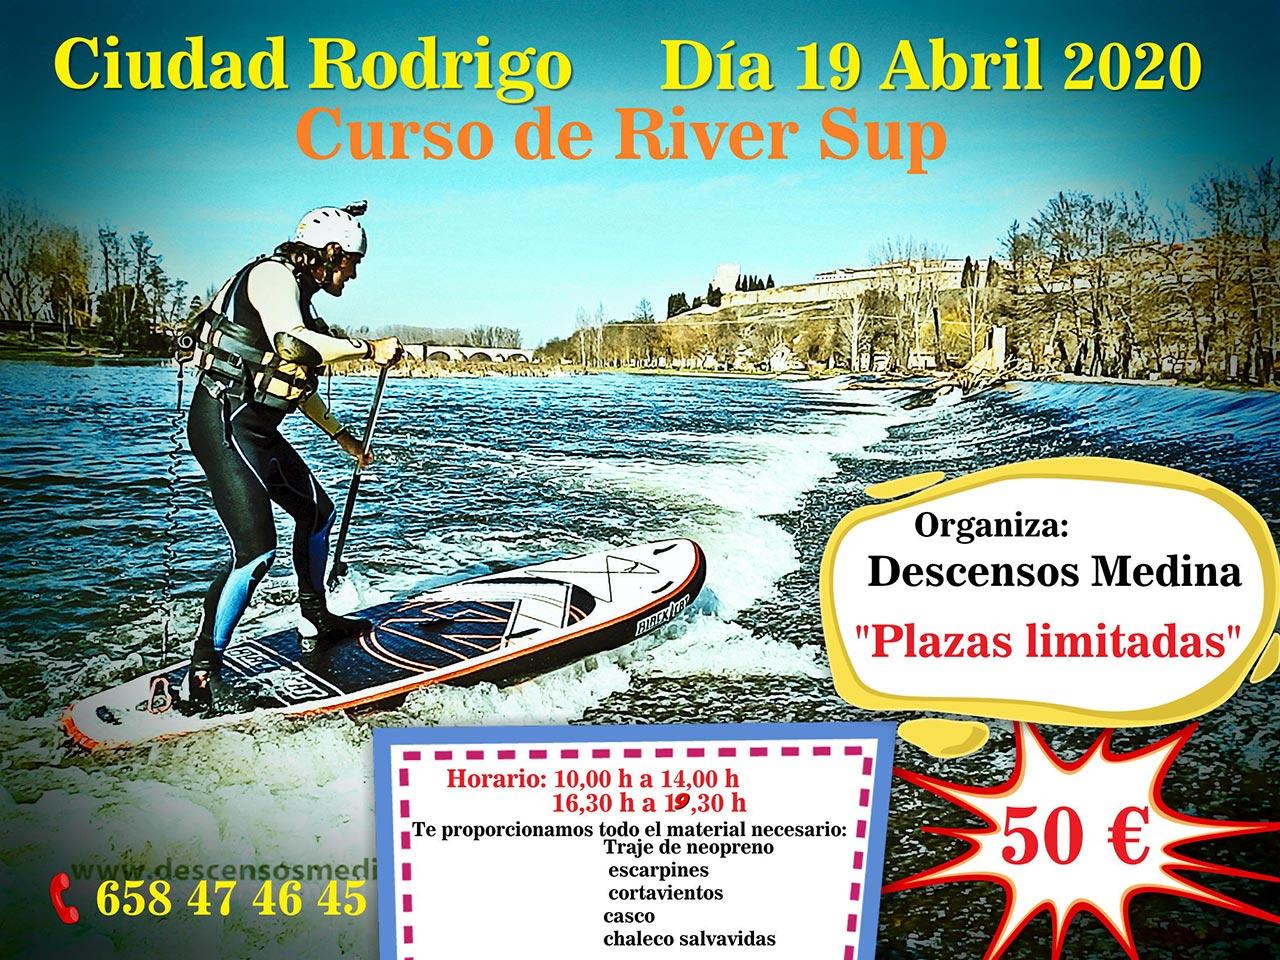 descensosmedina-curso-iniciacion-river-sup-19-04-2020